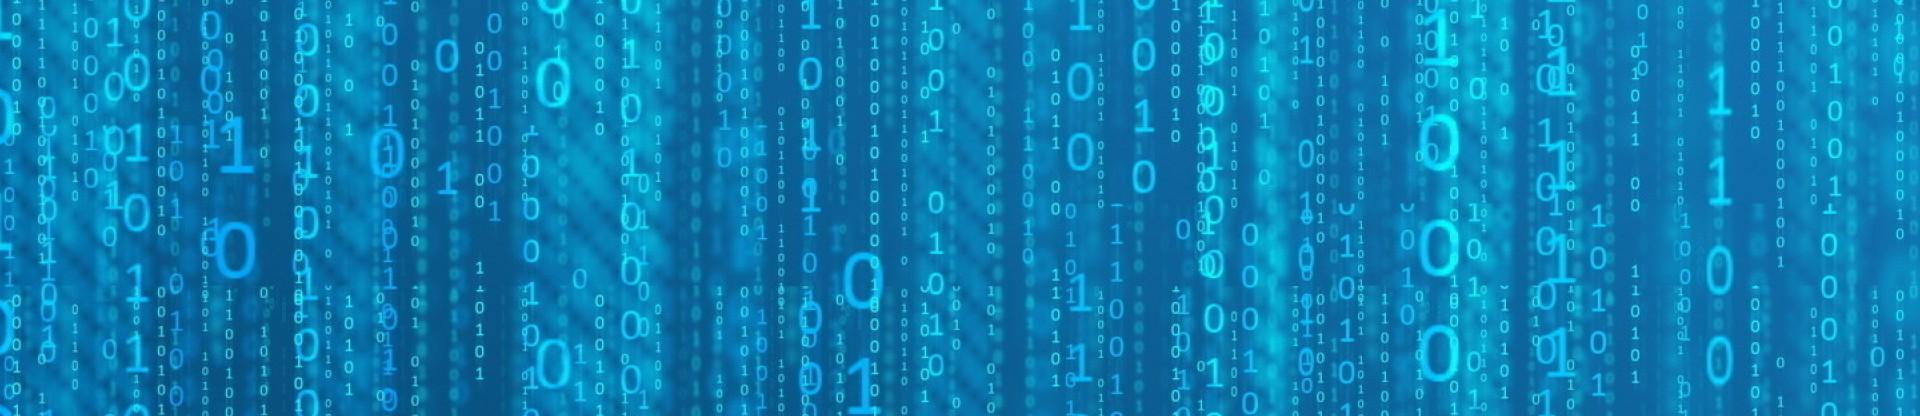 Binary-Numbers-0-1-Code-Matrix-Blue-Hack-Pattern-Abstract-WallpapersByte-com-2560x1080-e1484830965175